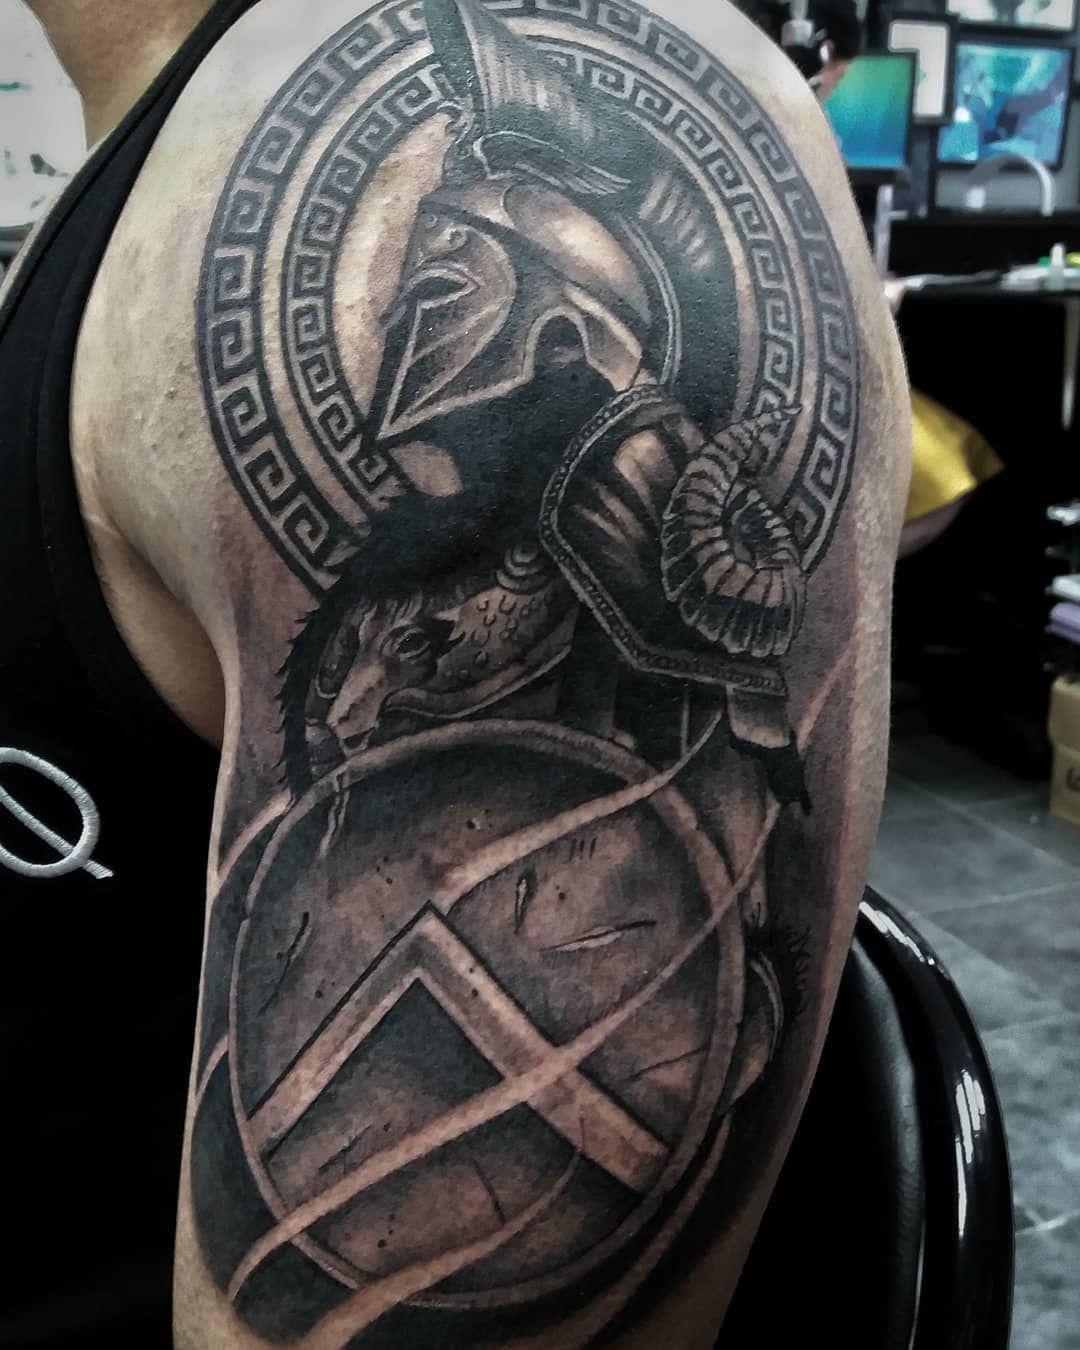 Spartan Warrior Jaman Knz Gmail Com Nextchaptertattoostudio Jaman Tattoo Tat Tattooideas Tattodesign Bla Spartan Tattoo Gladiator Tattoo Warrior Tattoos